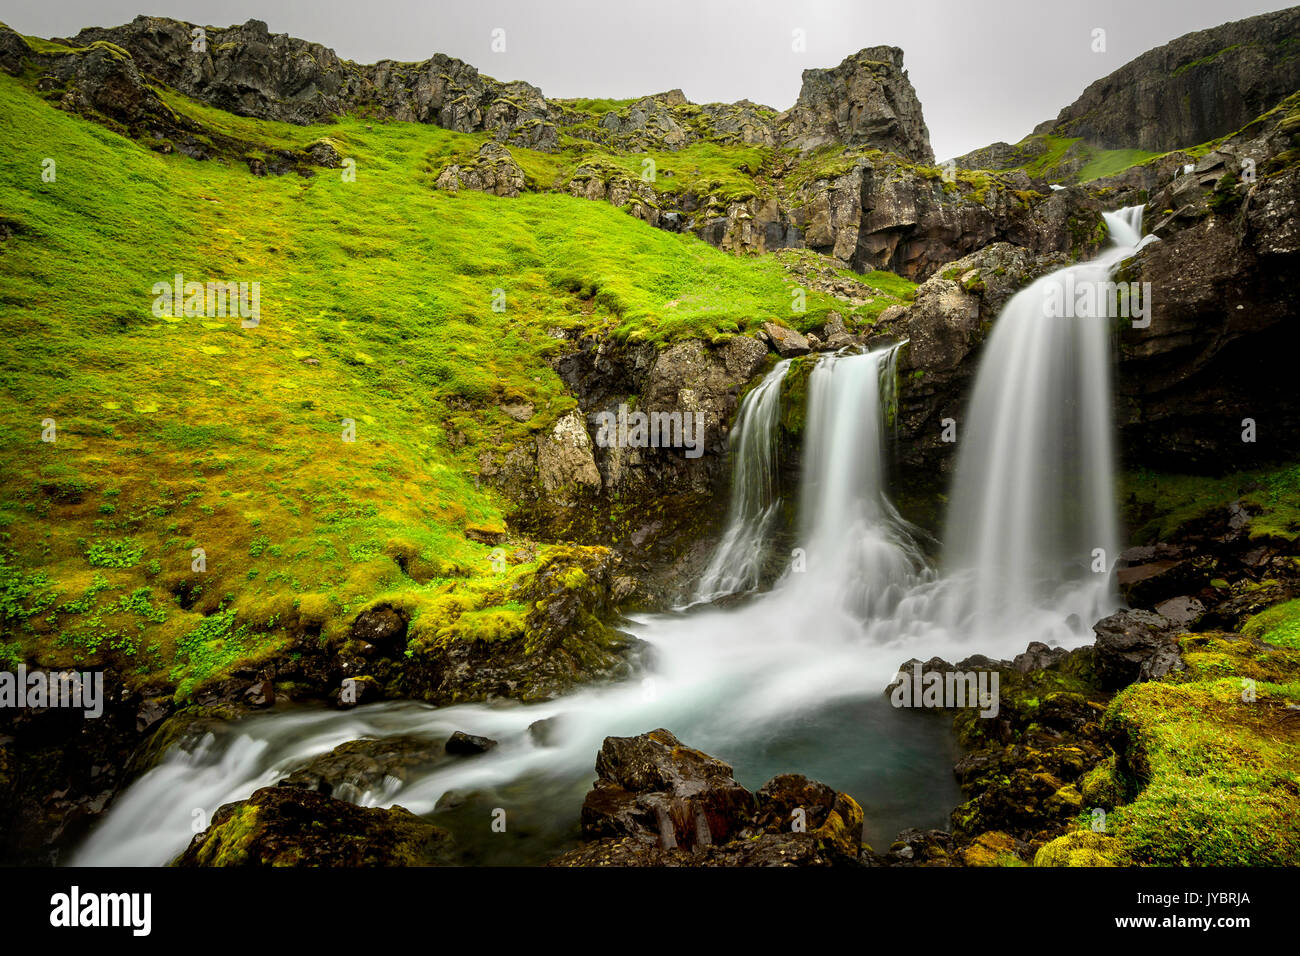 Bella cascata Klifbrekkafossar nell est dell'Islanda. Immagini Stock